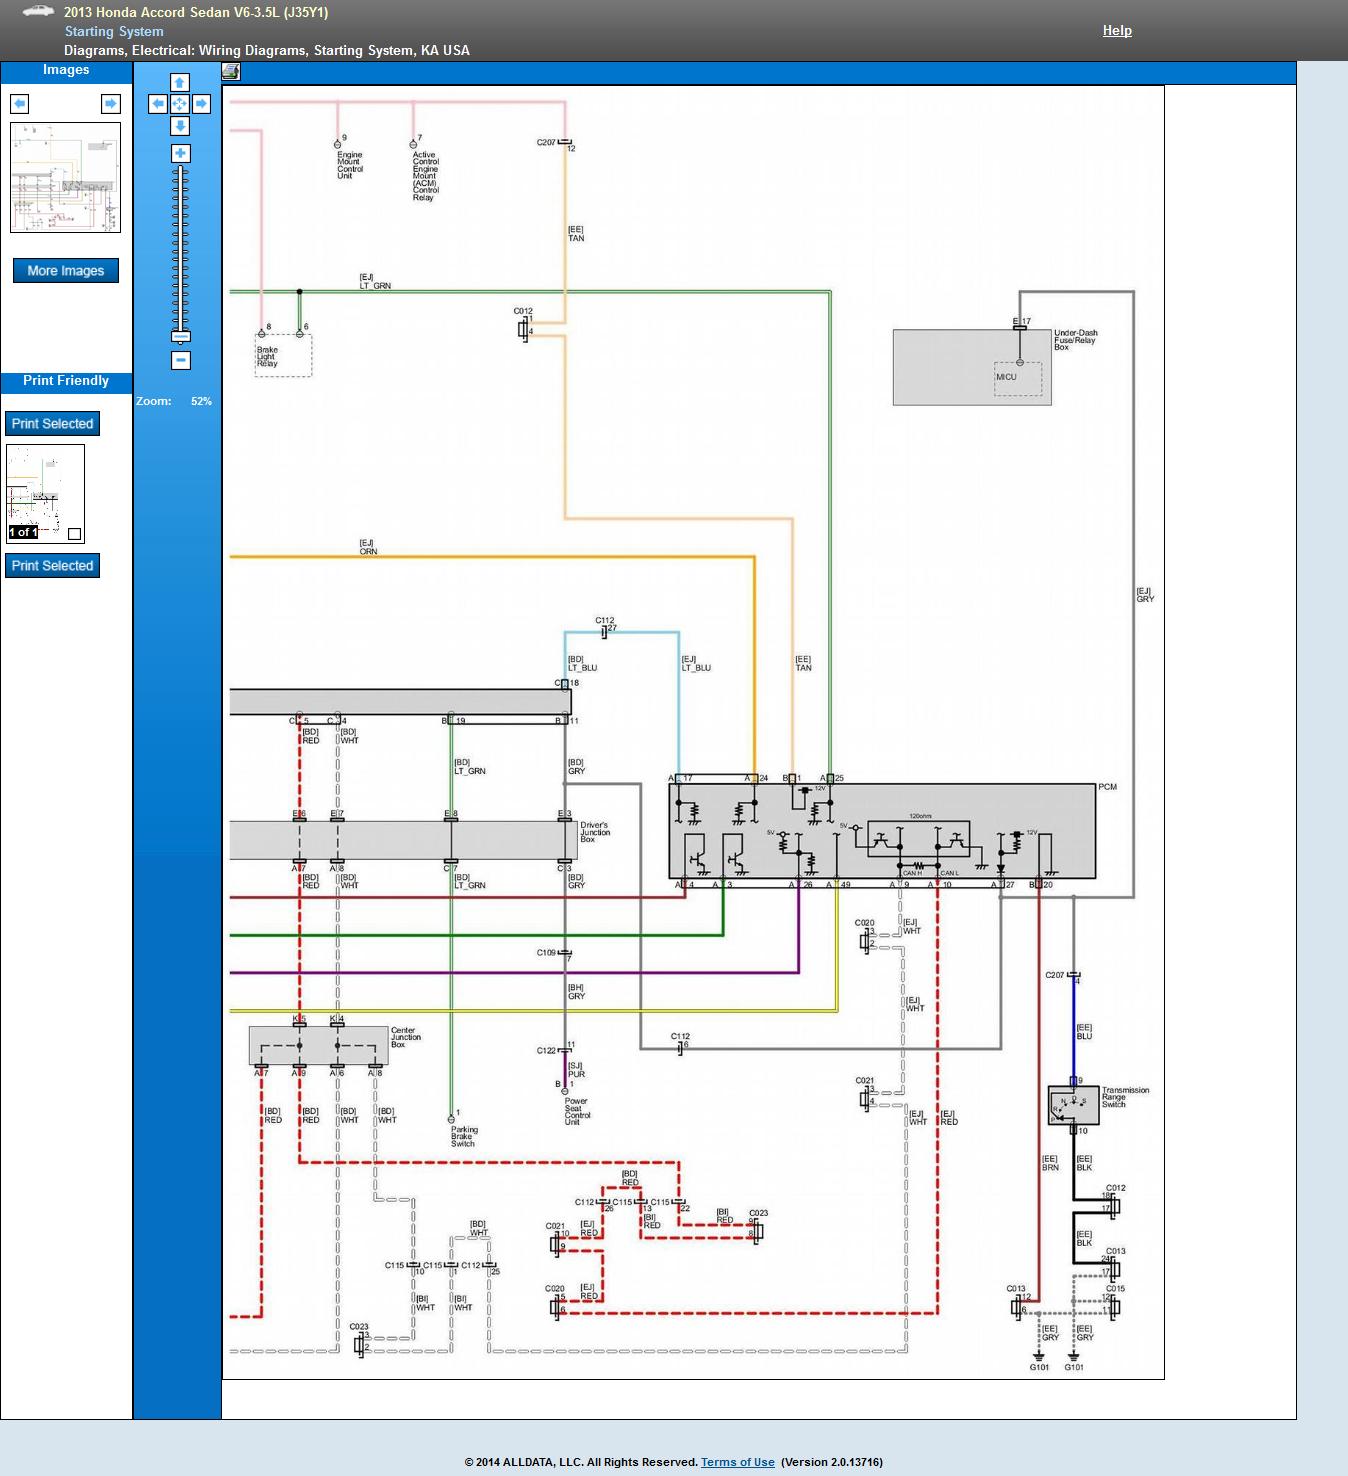 Honda Accord Wiring Diagram 2013 - Wiring Diagrams DataUssel